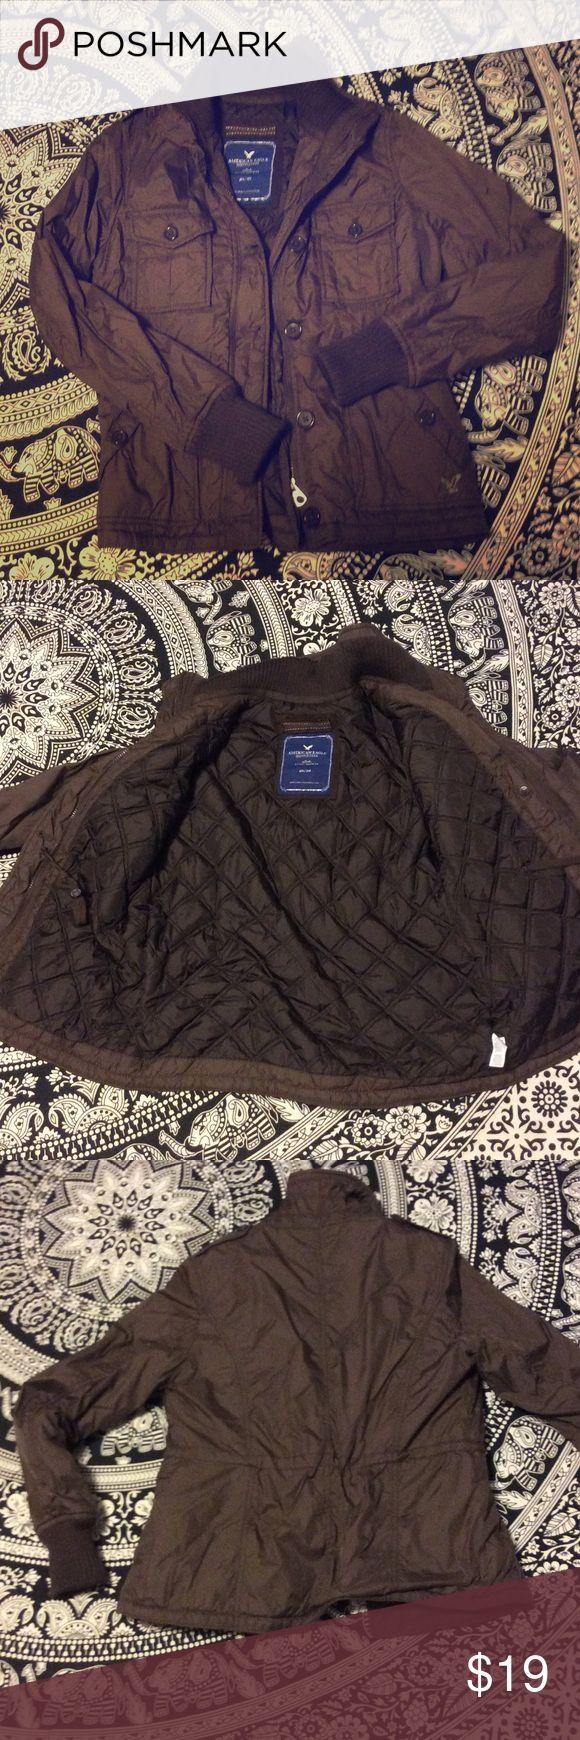 American Eagle jacket Like new. Super warm. American Eagle Outfitters Jackets & Coats Utility Jackets